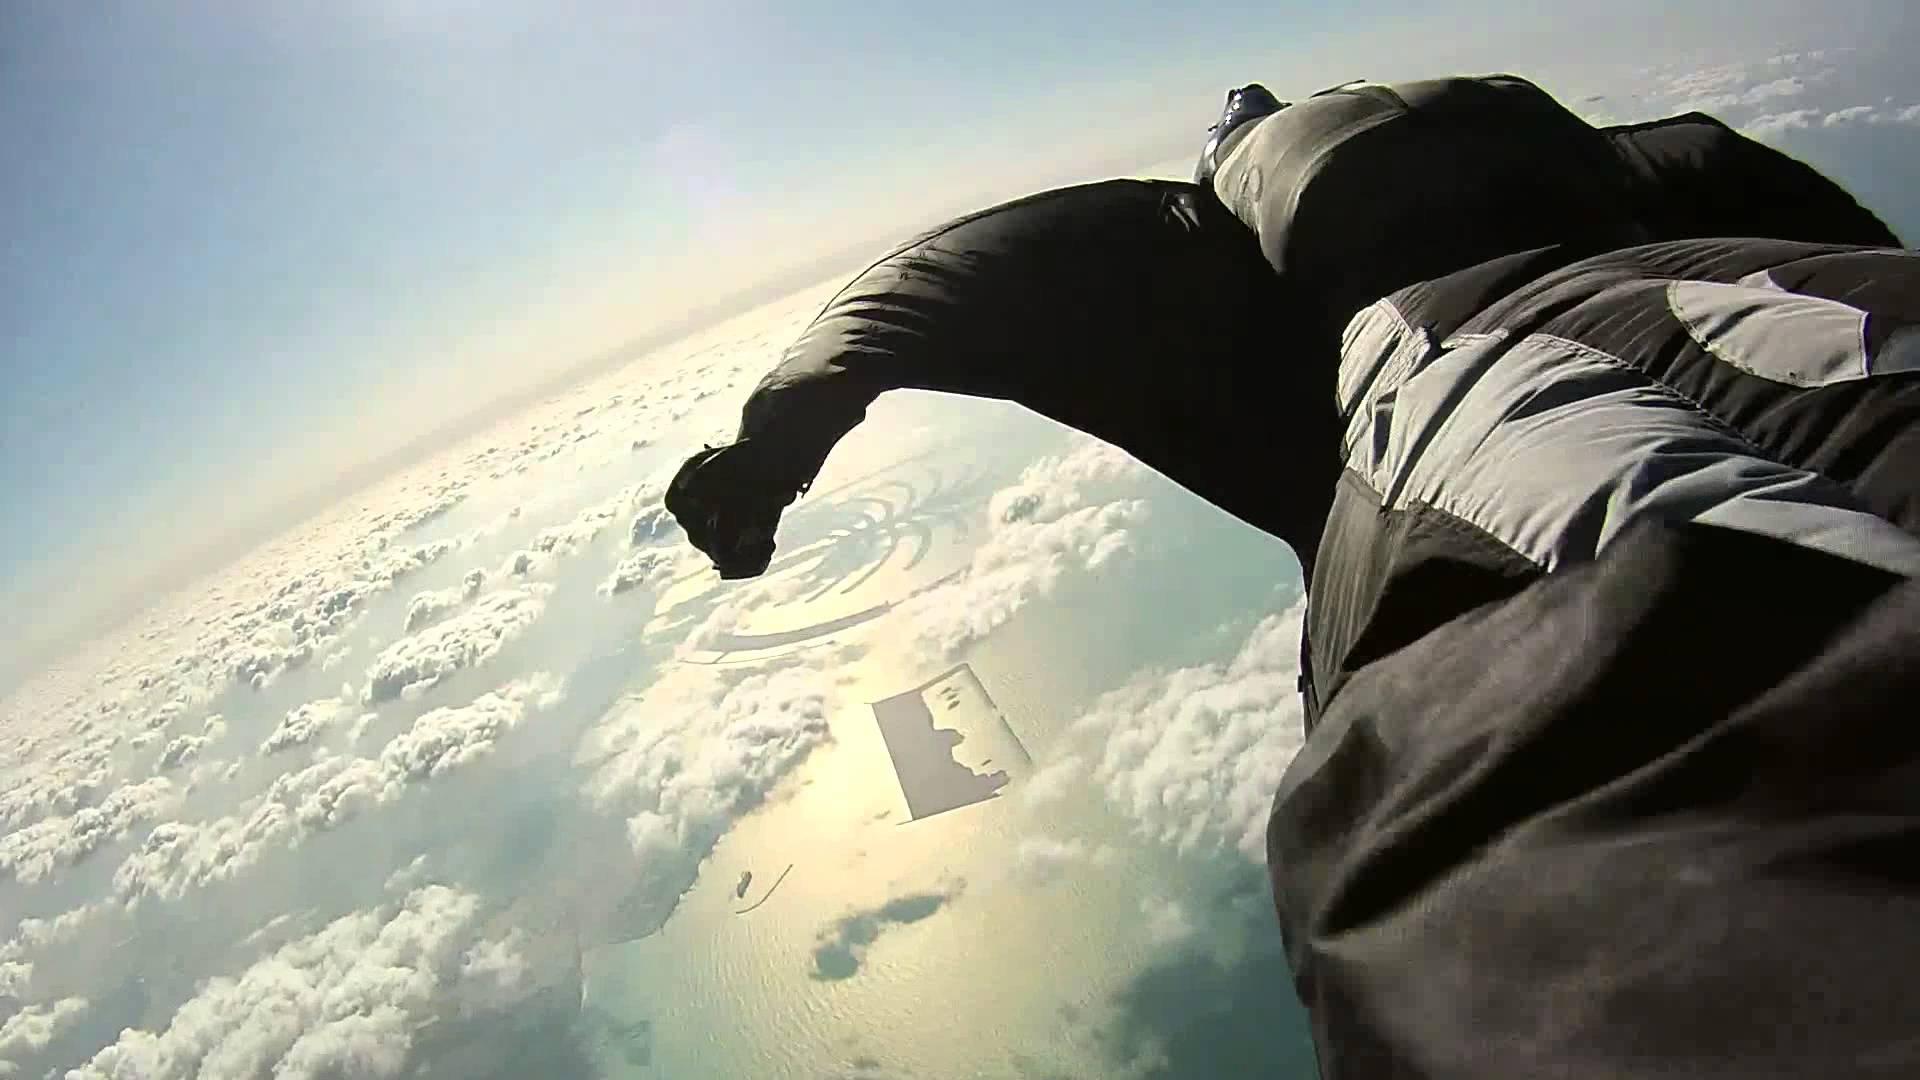 Base jumping wingsuit wallpaper